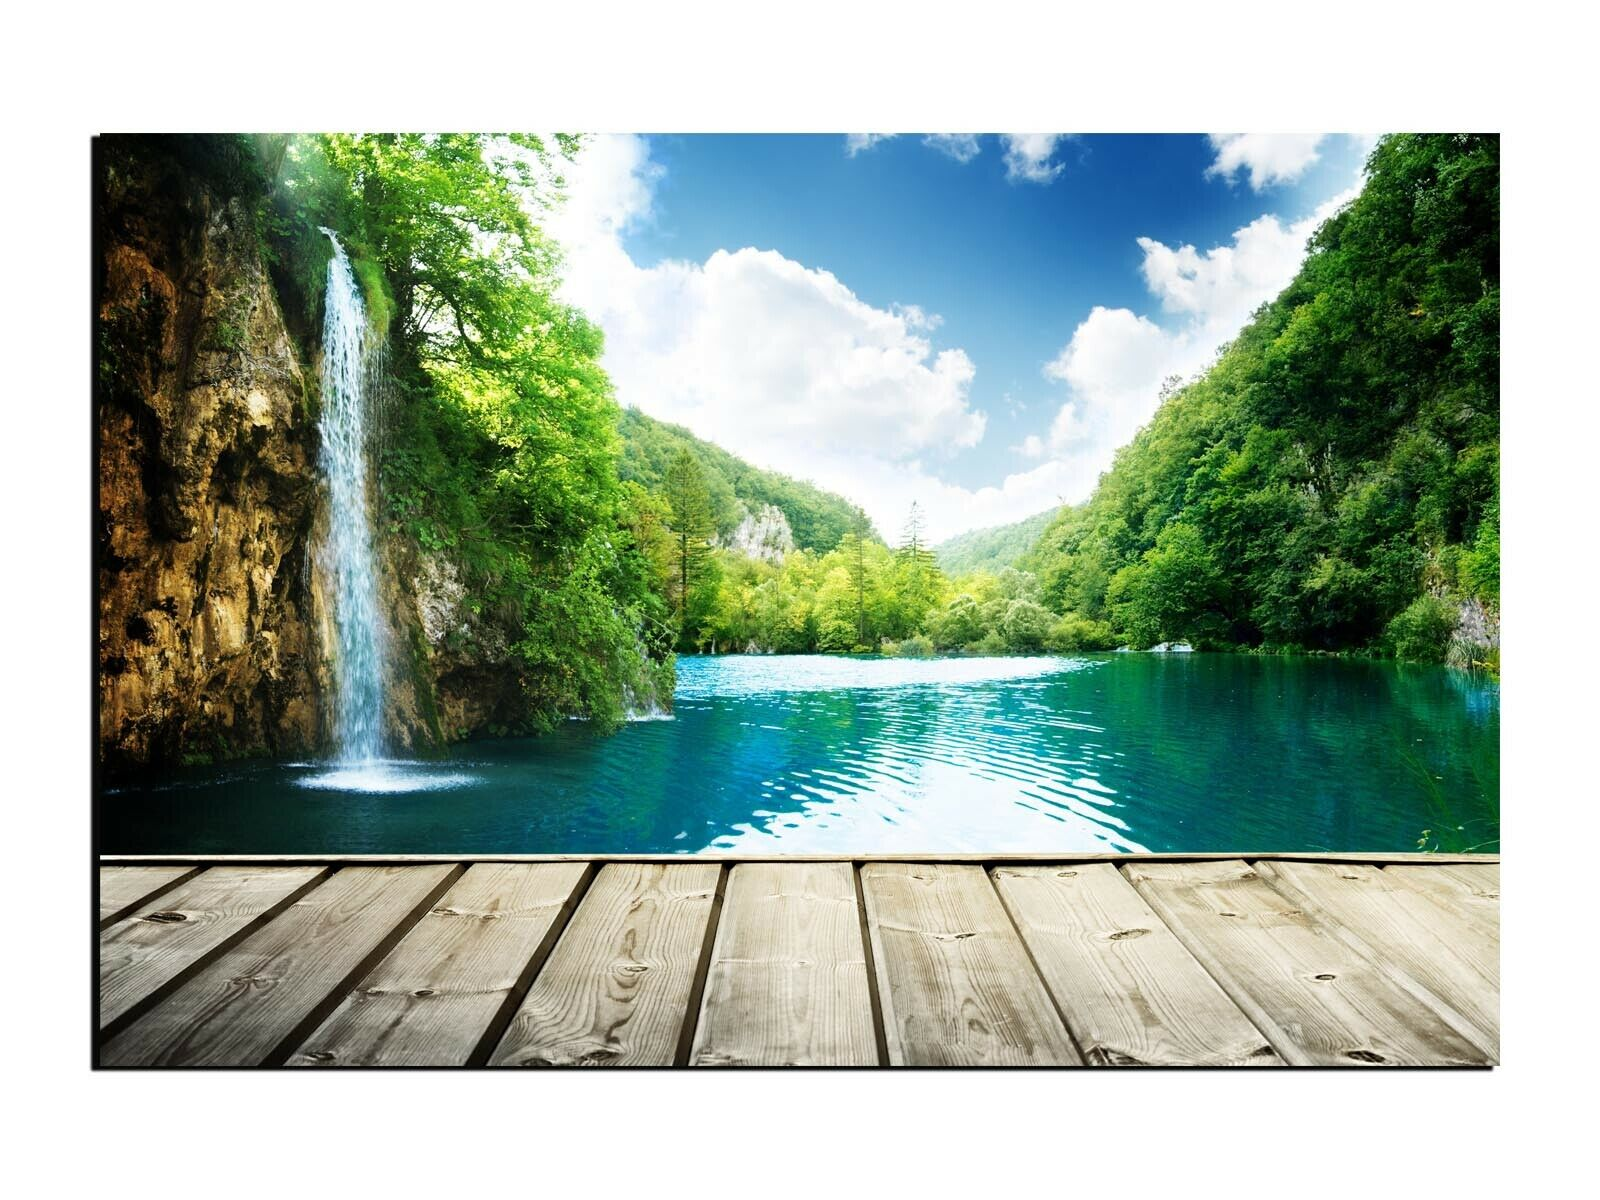 Alu-Dibond Wandbild Blick auf einen Wasserfall in den Tropen AB-668 Butlerfinish